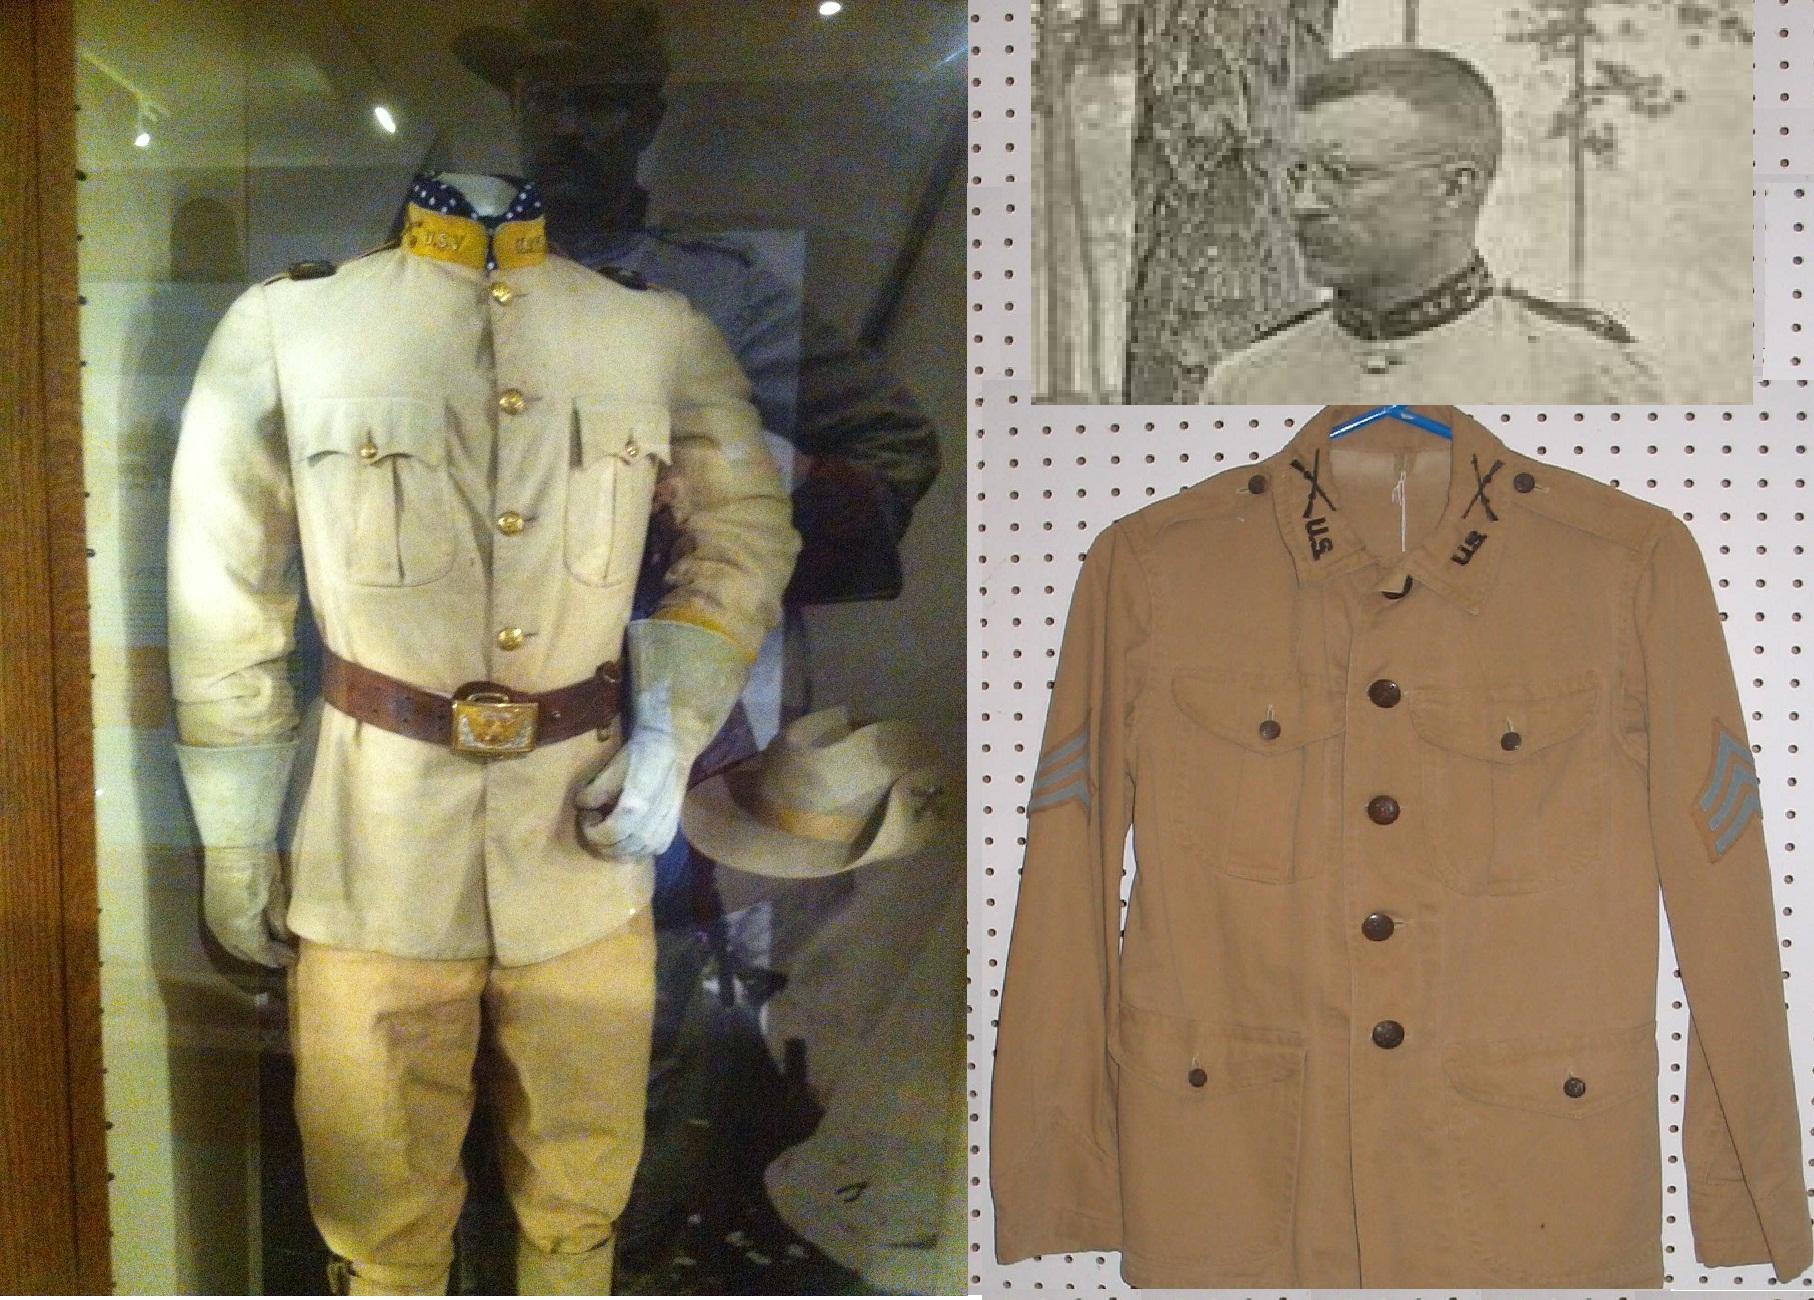 tr�s mark on us army uniforms theodorerooseveltorg